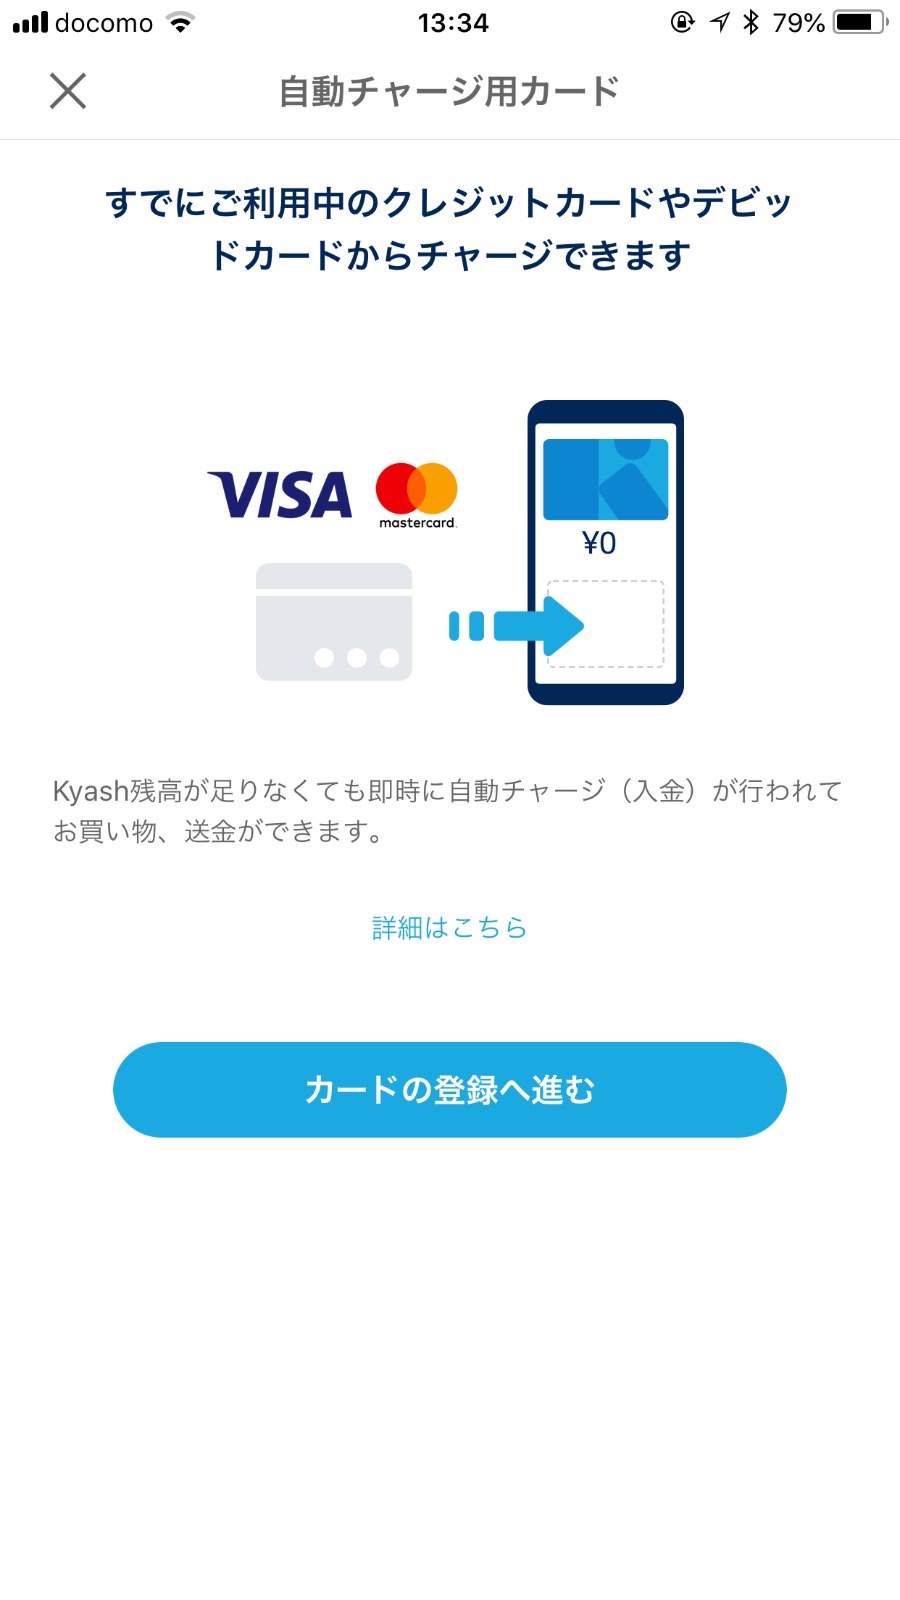 「Kyash」チャージ用クレジットカードを登録 03